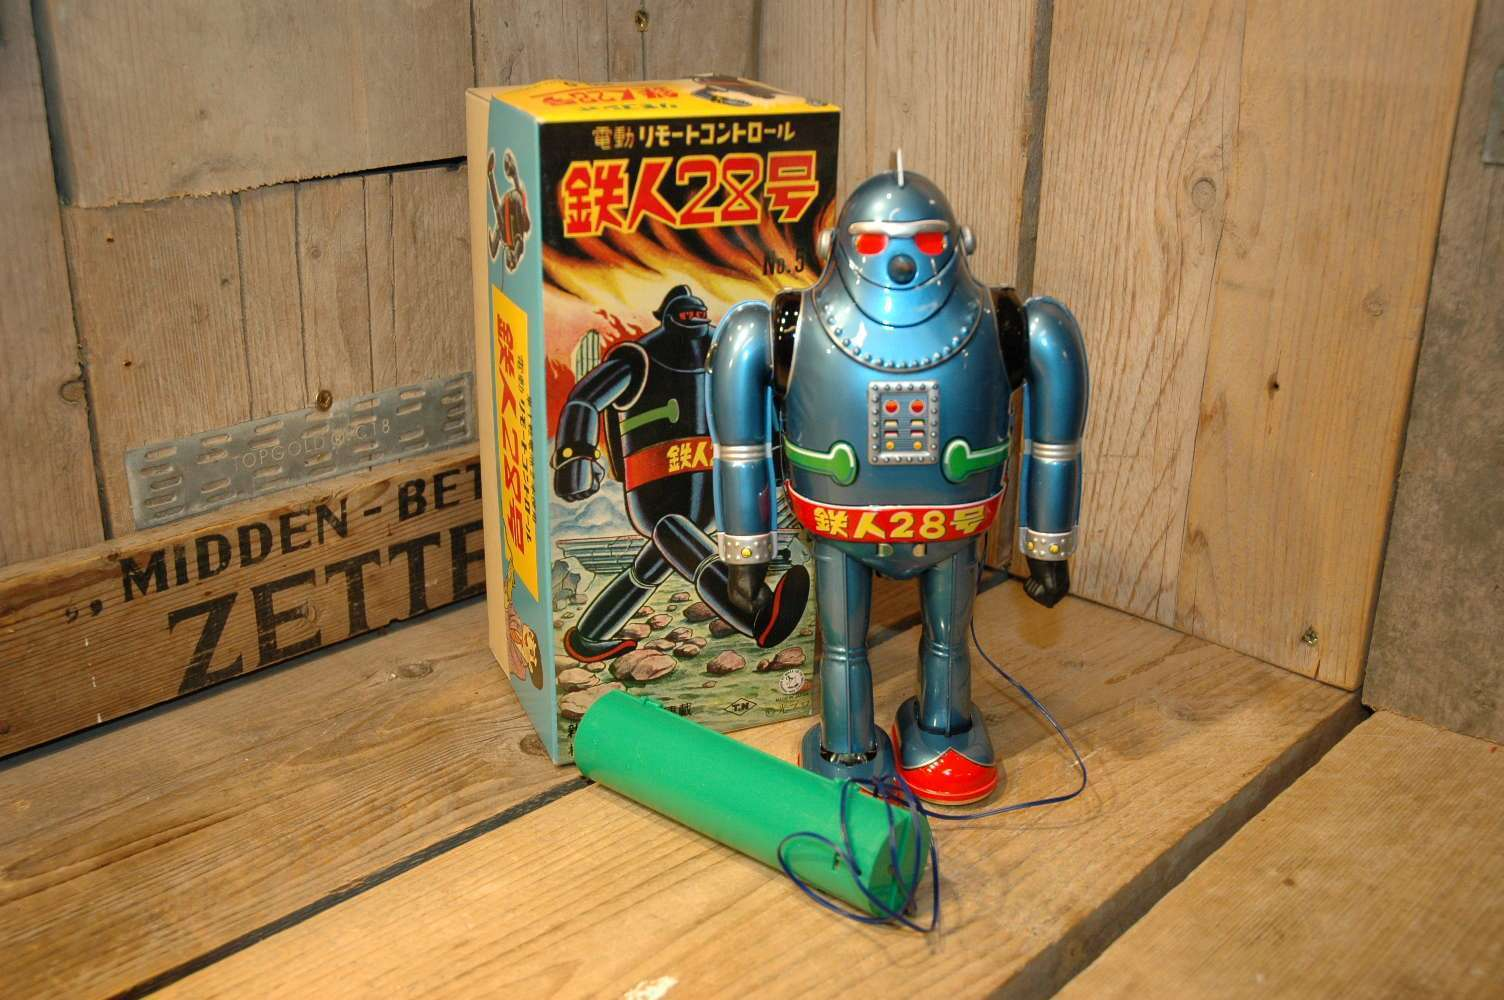 Osaka Tin Toy Institute – Gigantor no.5 Tetsujin 28 Robot Light Blue Variation